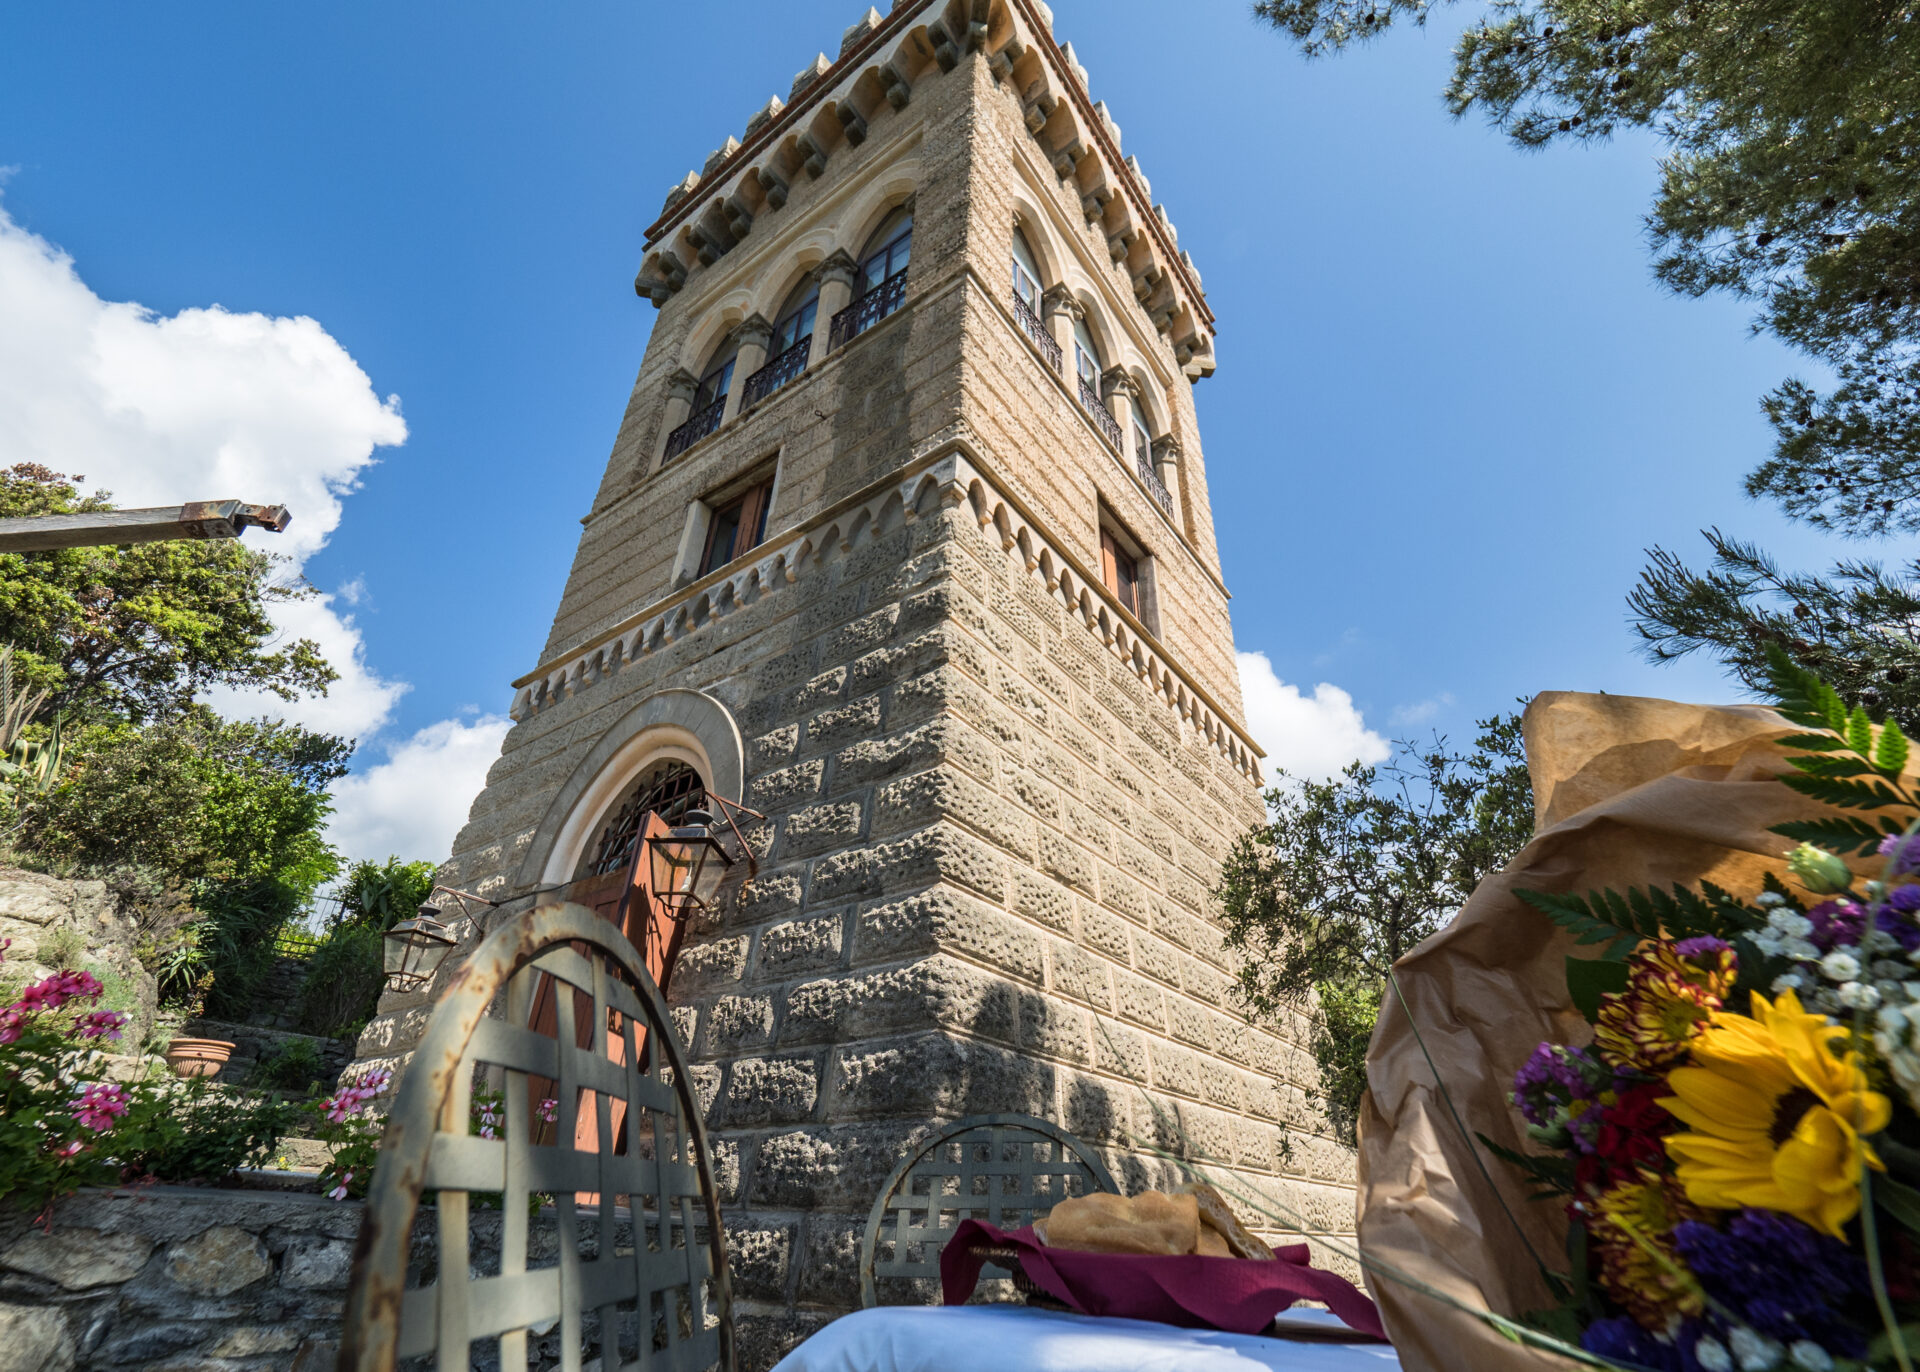 La Torre dei Merli Luxury Collection